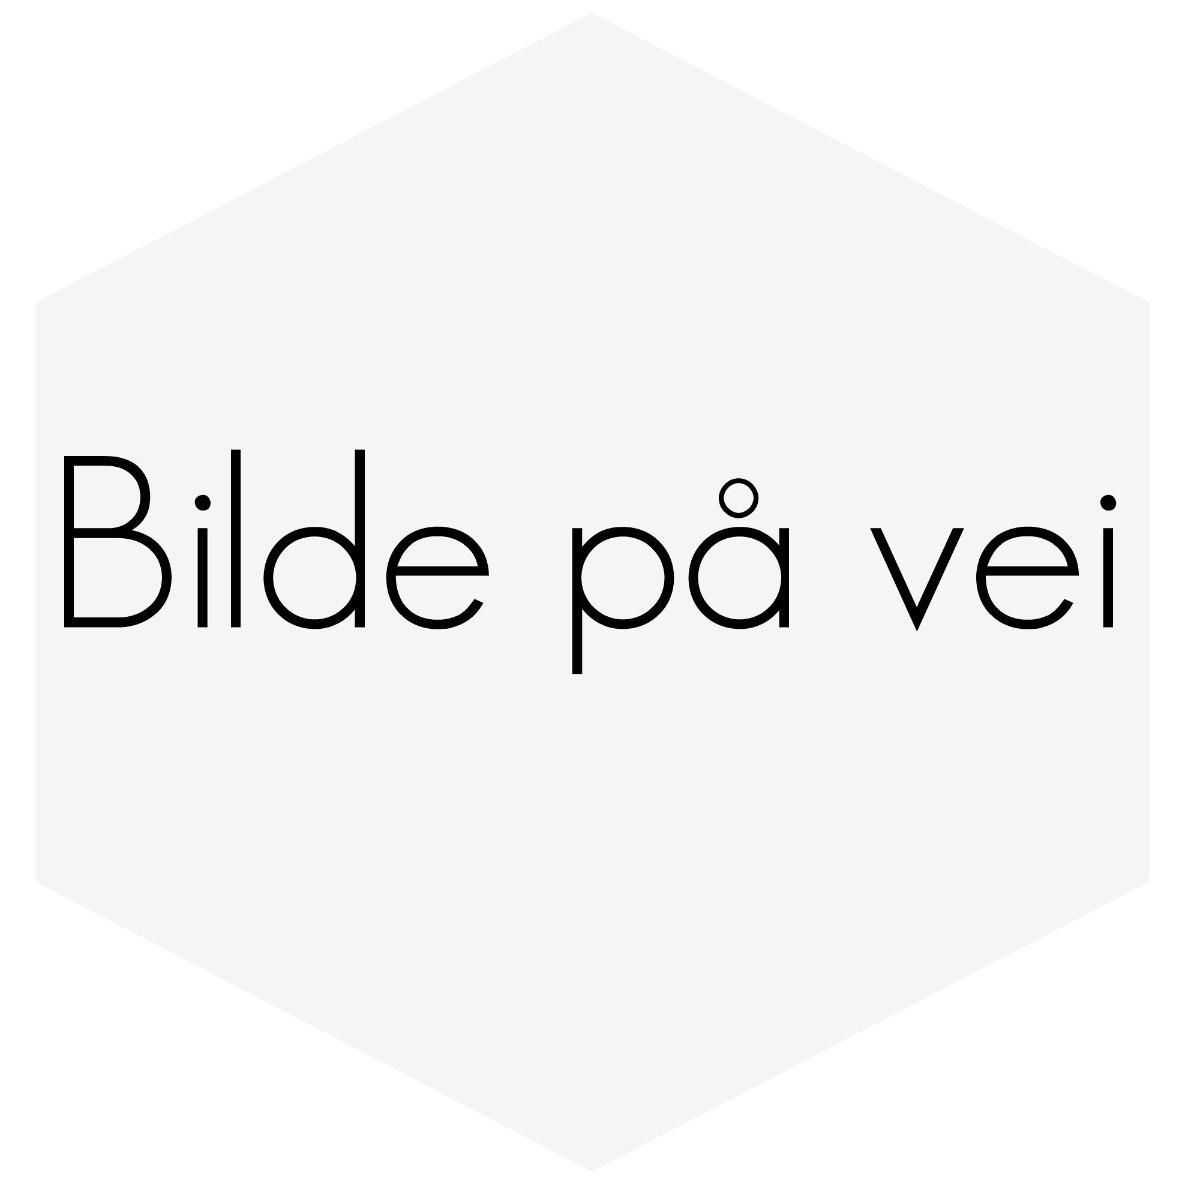 STØTDEMPER FORAN BILSTEIN SPORT TIL VOLVO V70,S80,S60 SE INF